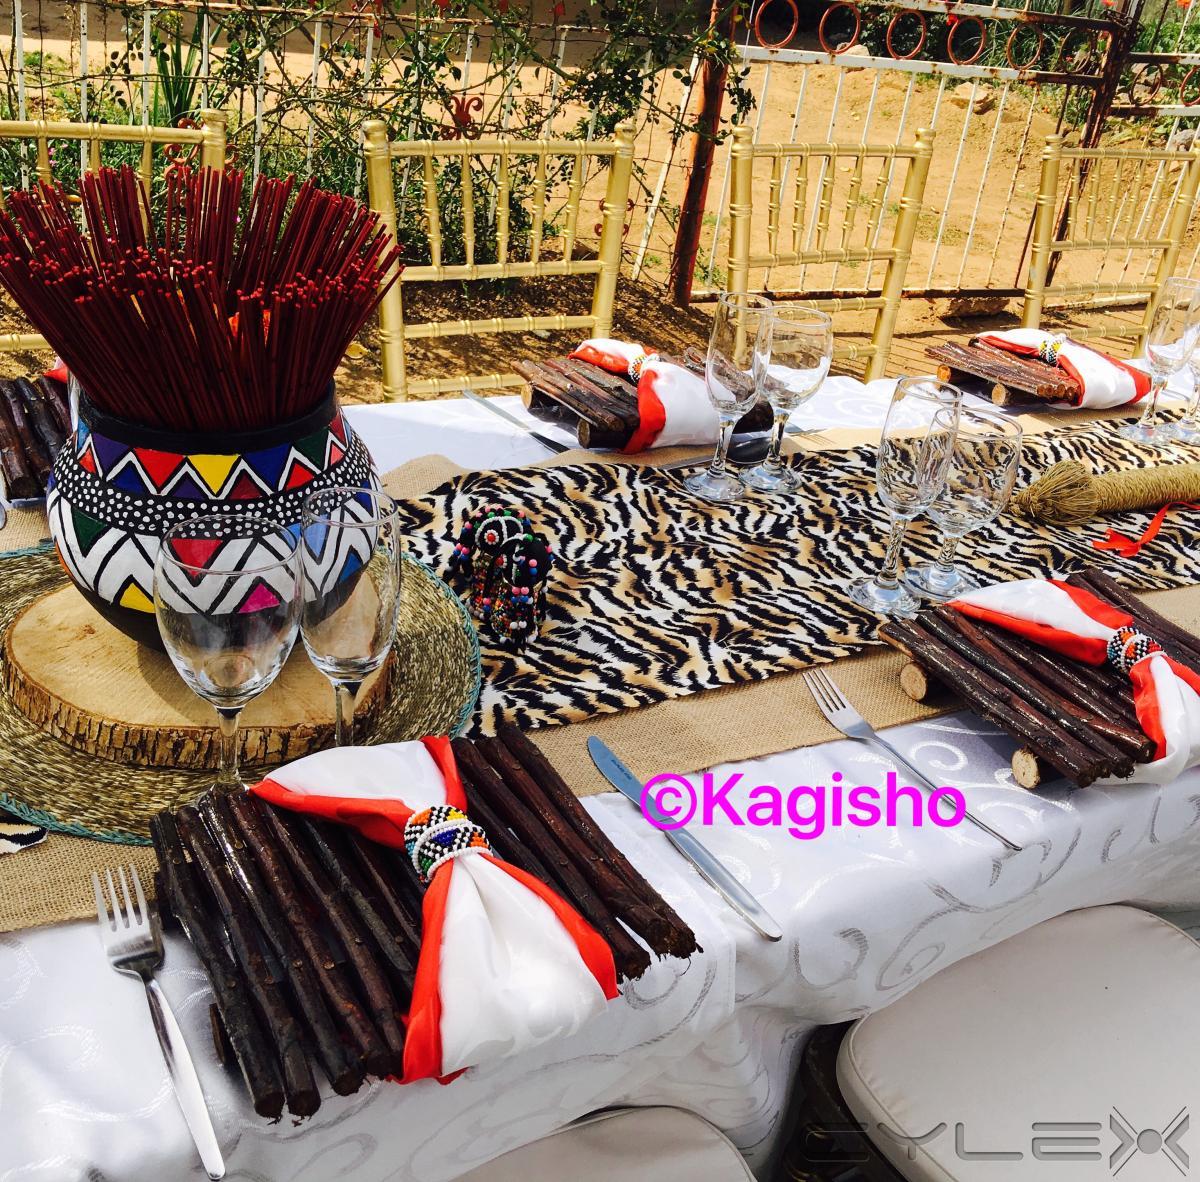 Kagisho Catering Centurion Cylex Profile